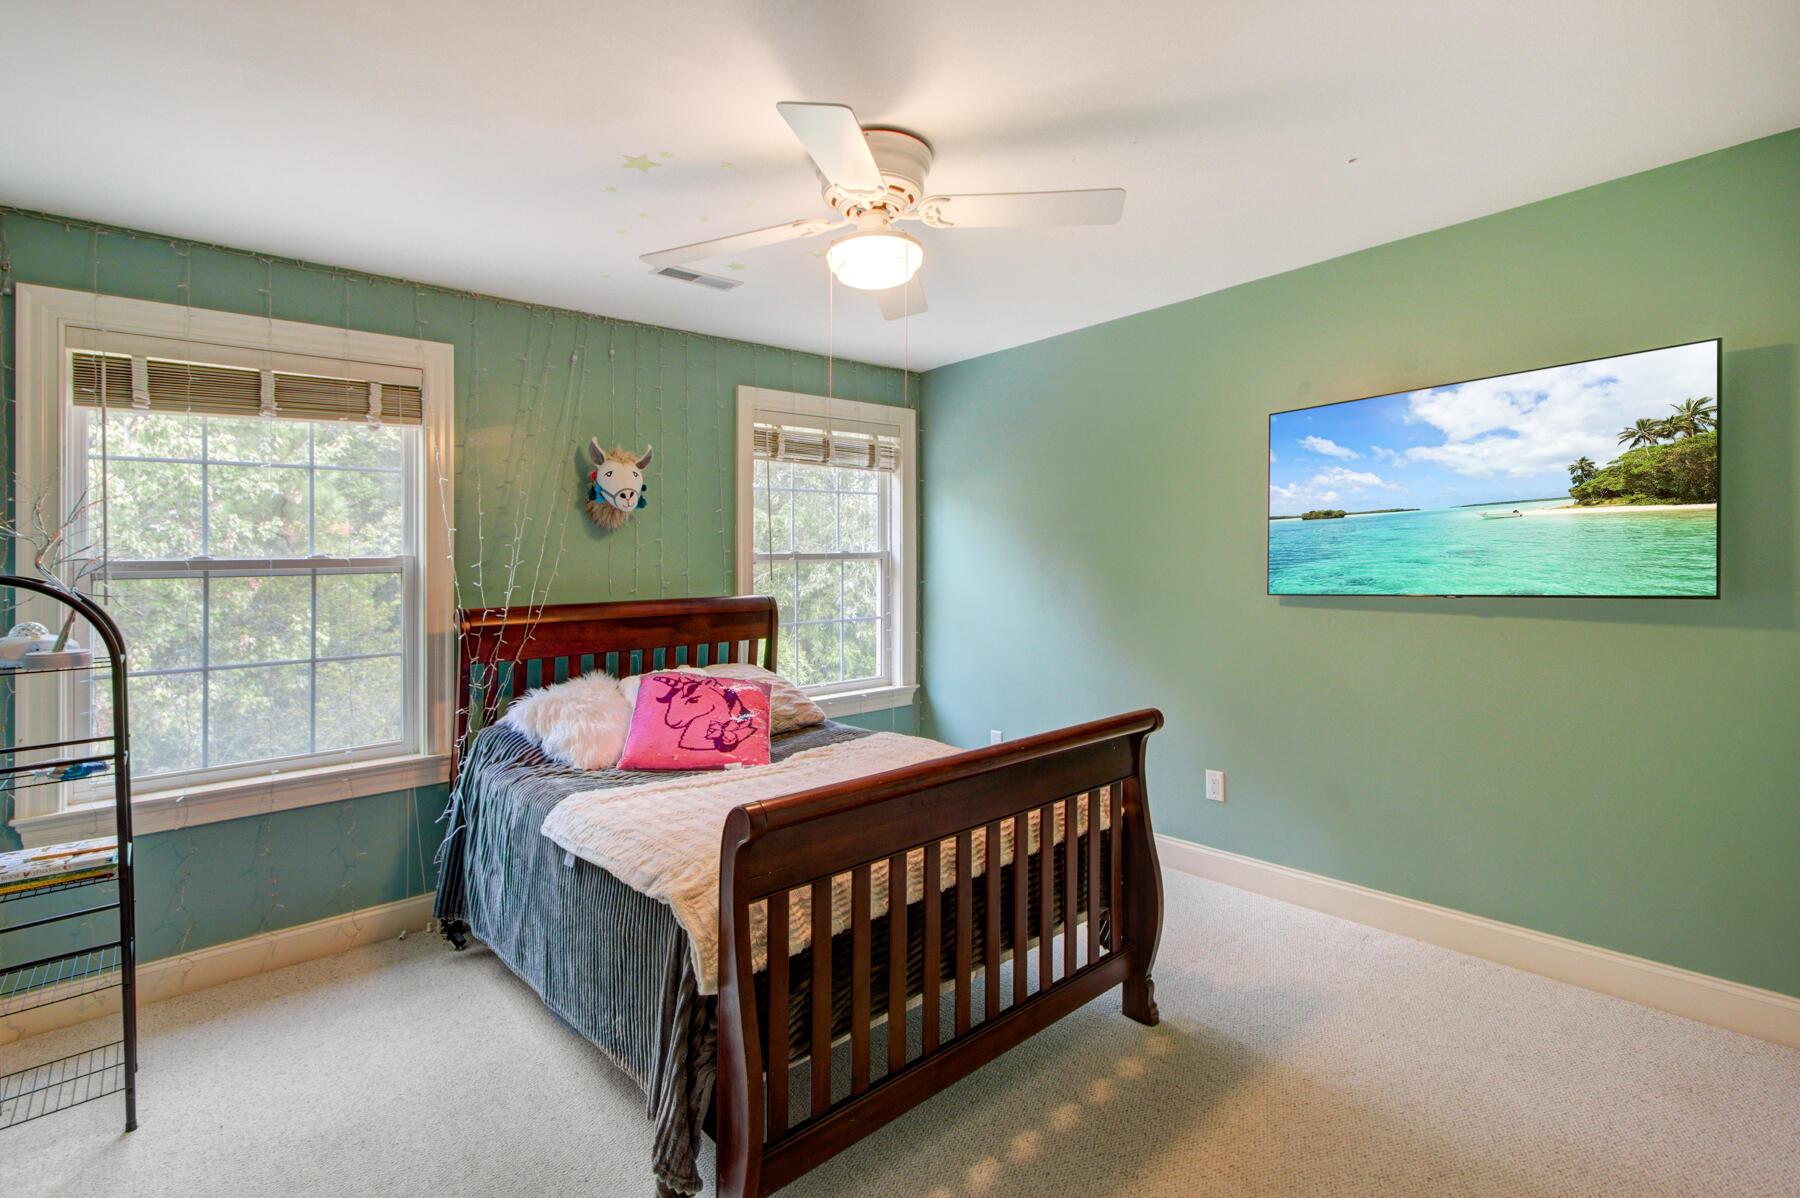 Dunes West Homes For Sale - 3095 Pignatelli, Mount Pleasant, SC - 51